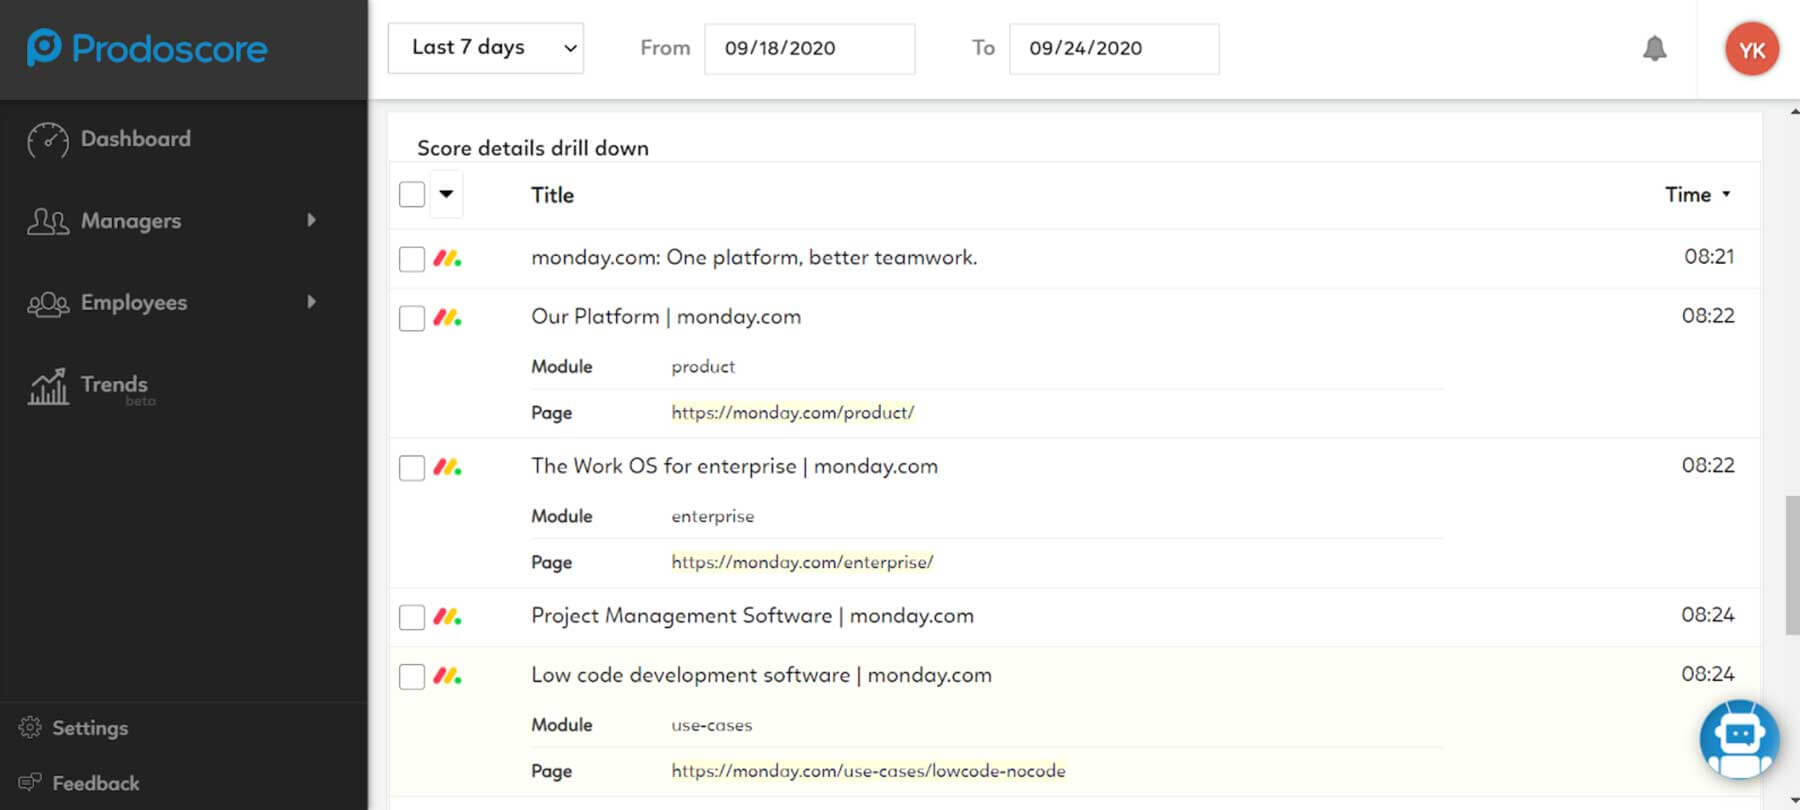 Prodoscore Dashboard - monday.com Integration